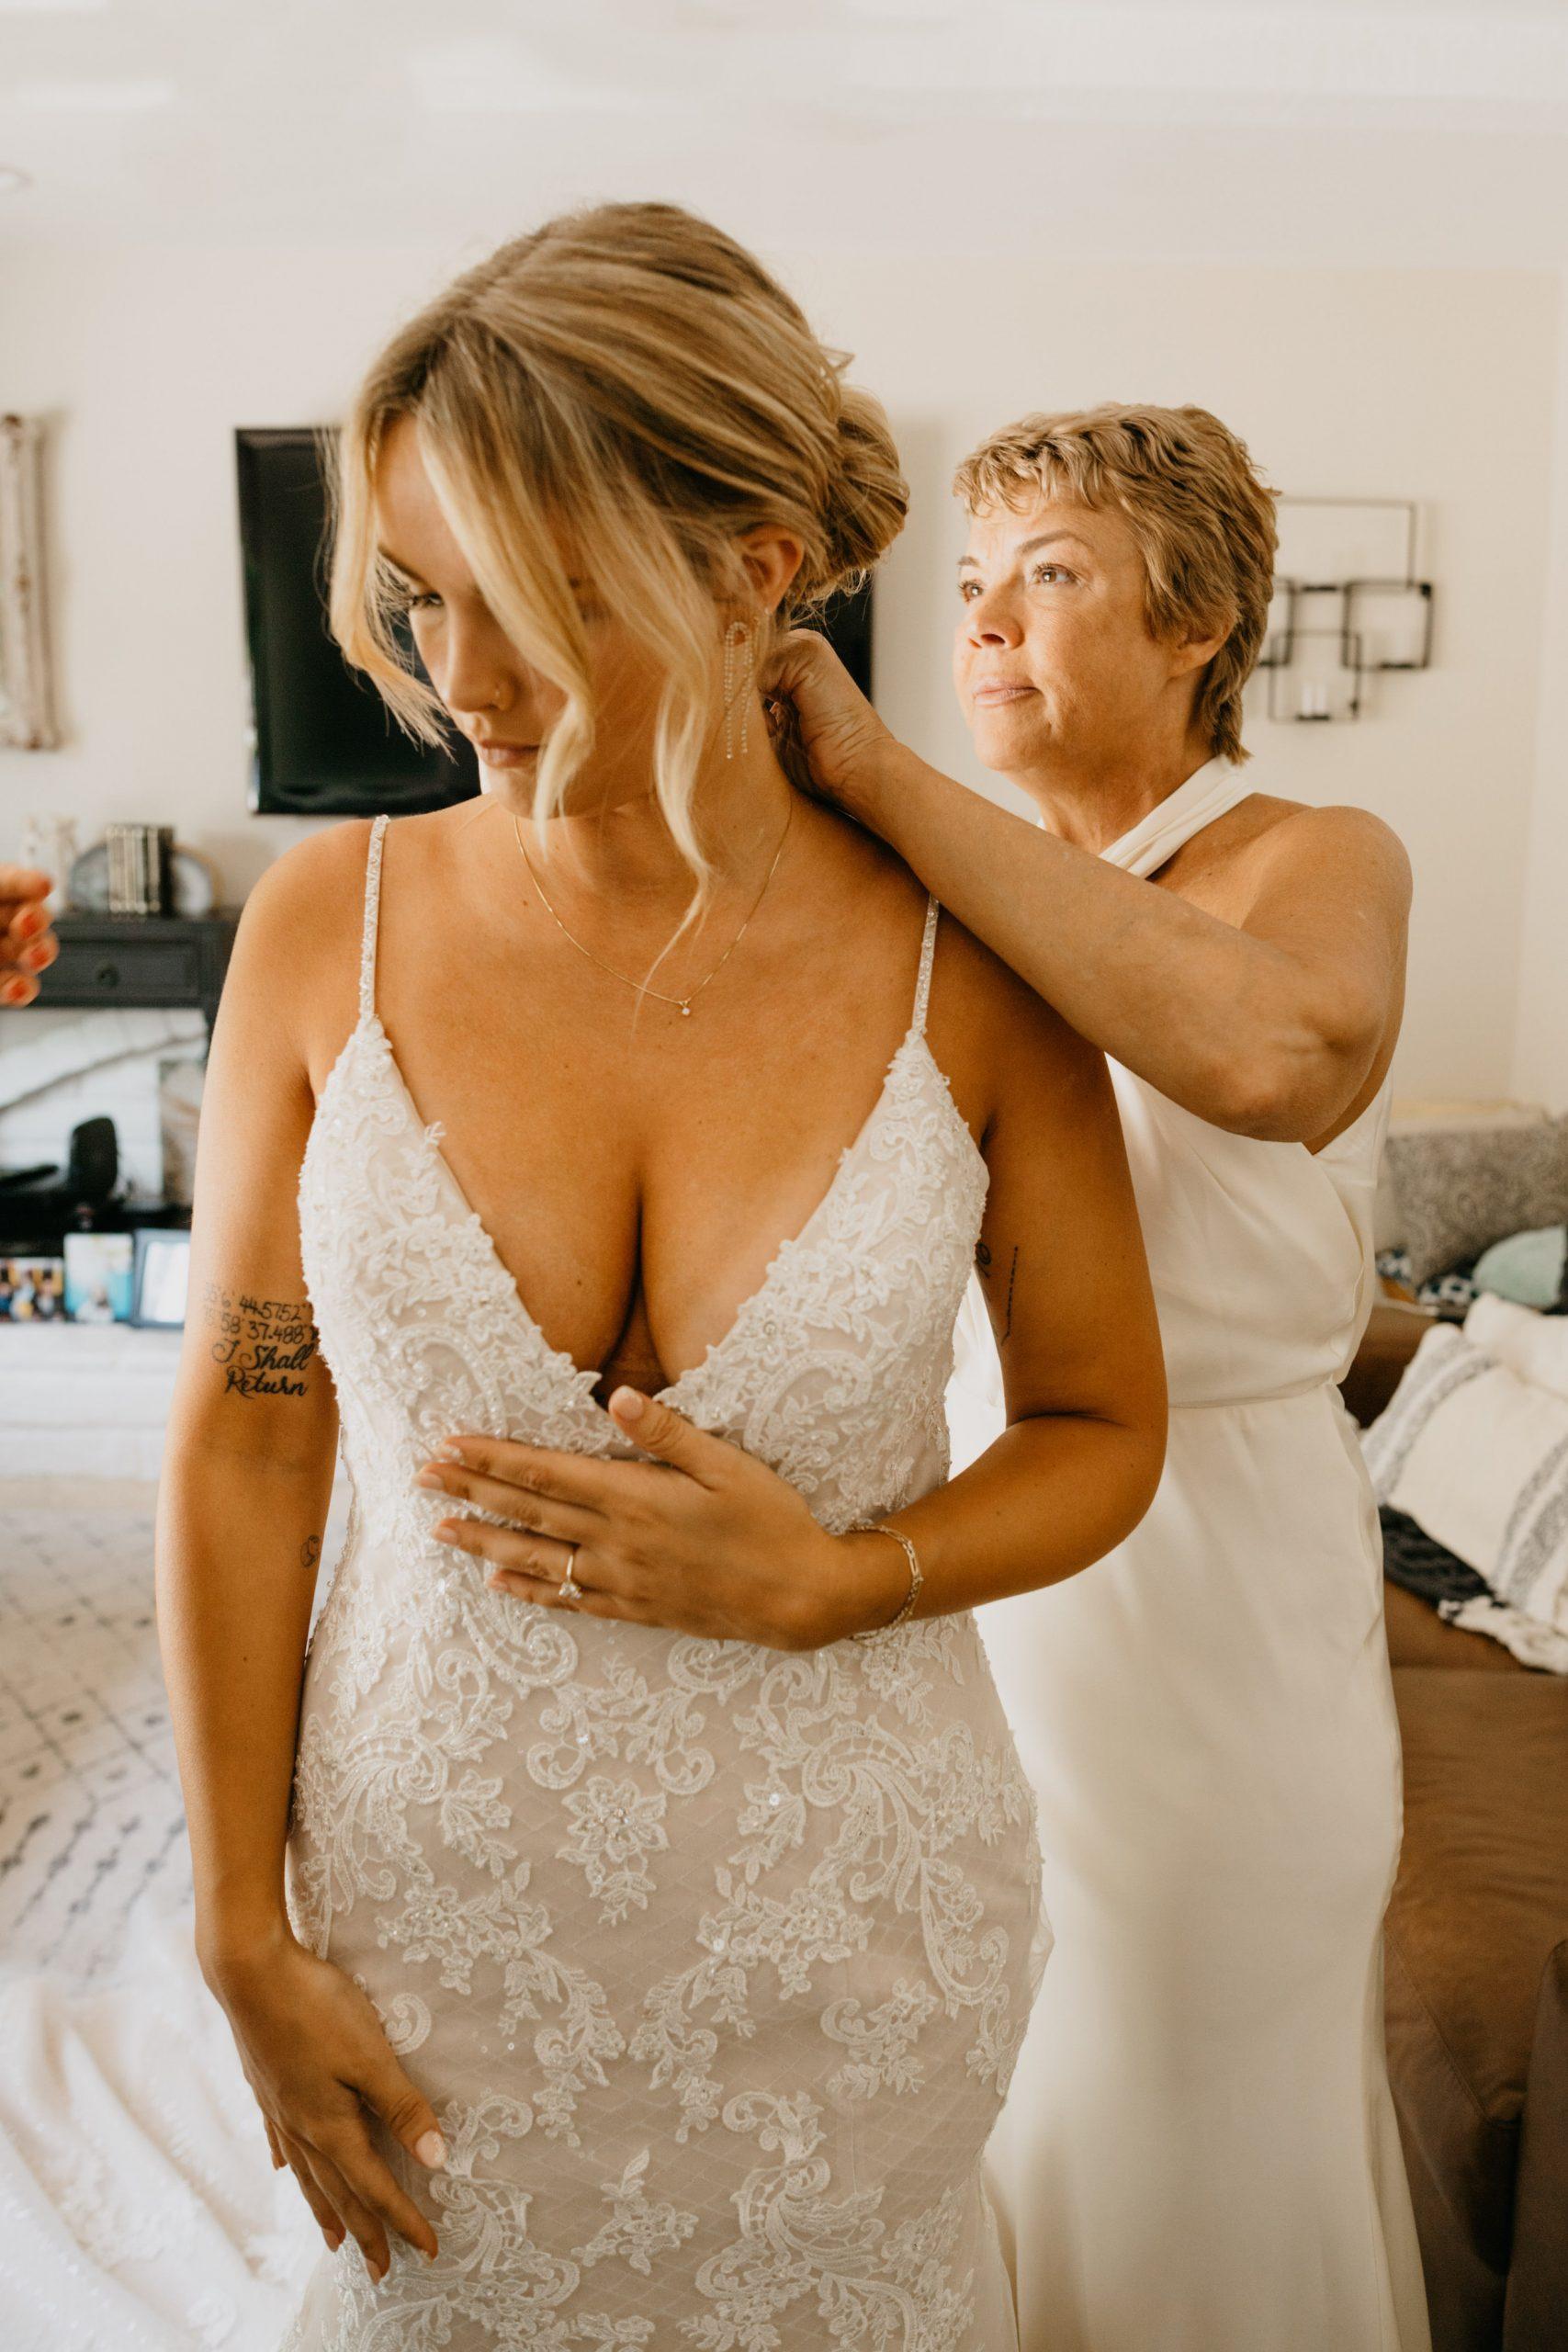 Mom and bride on wedding day in Laguna Beach, image by Fatima Elreda Photo